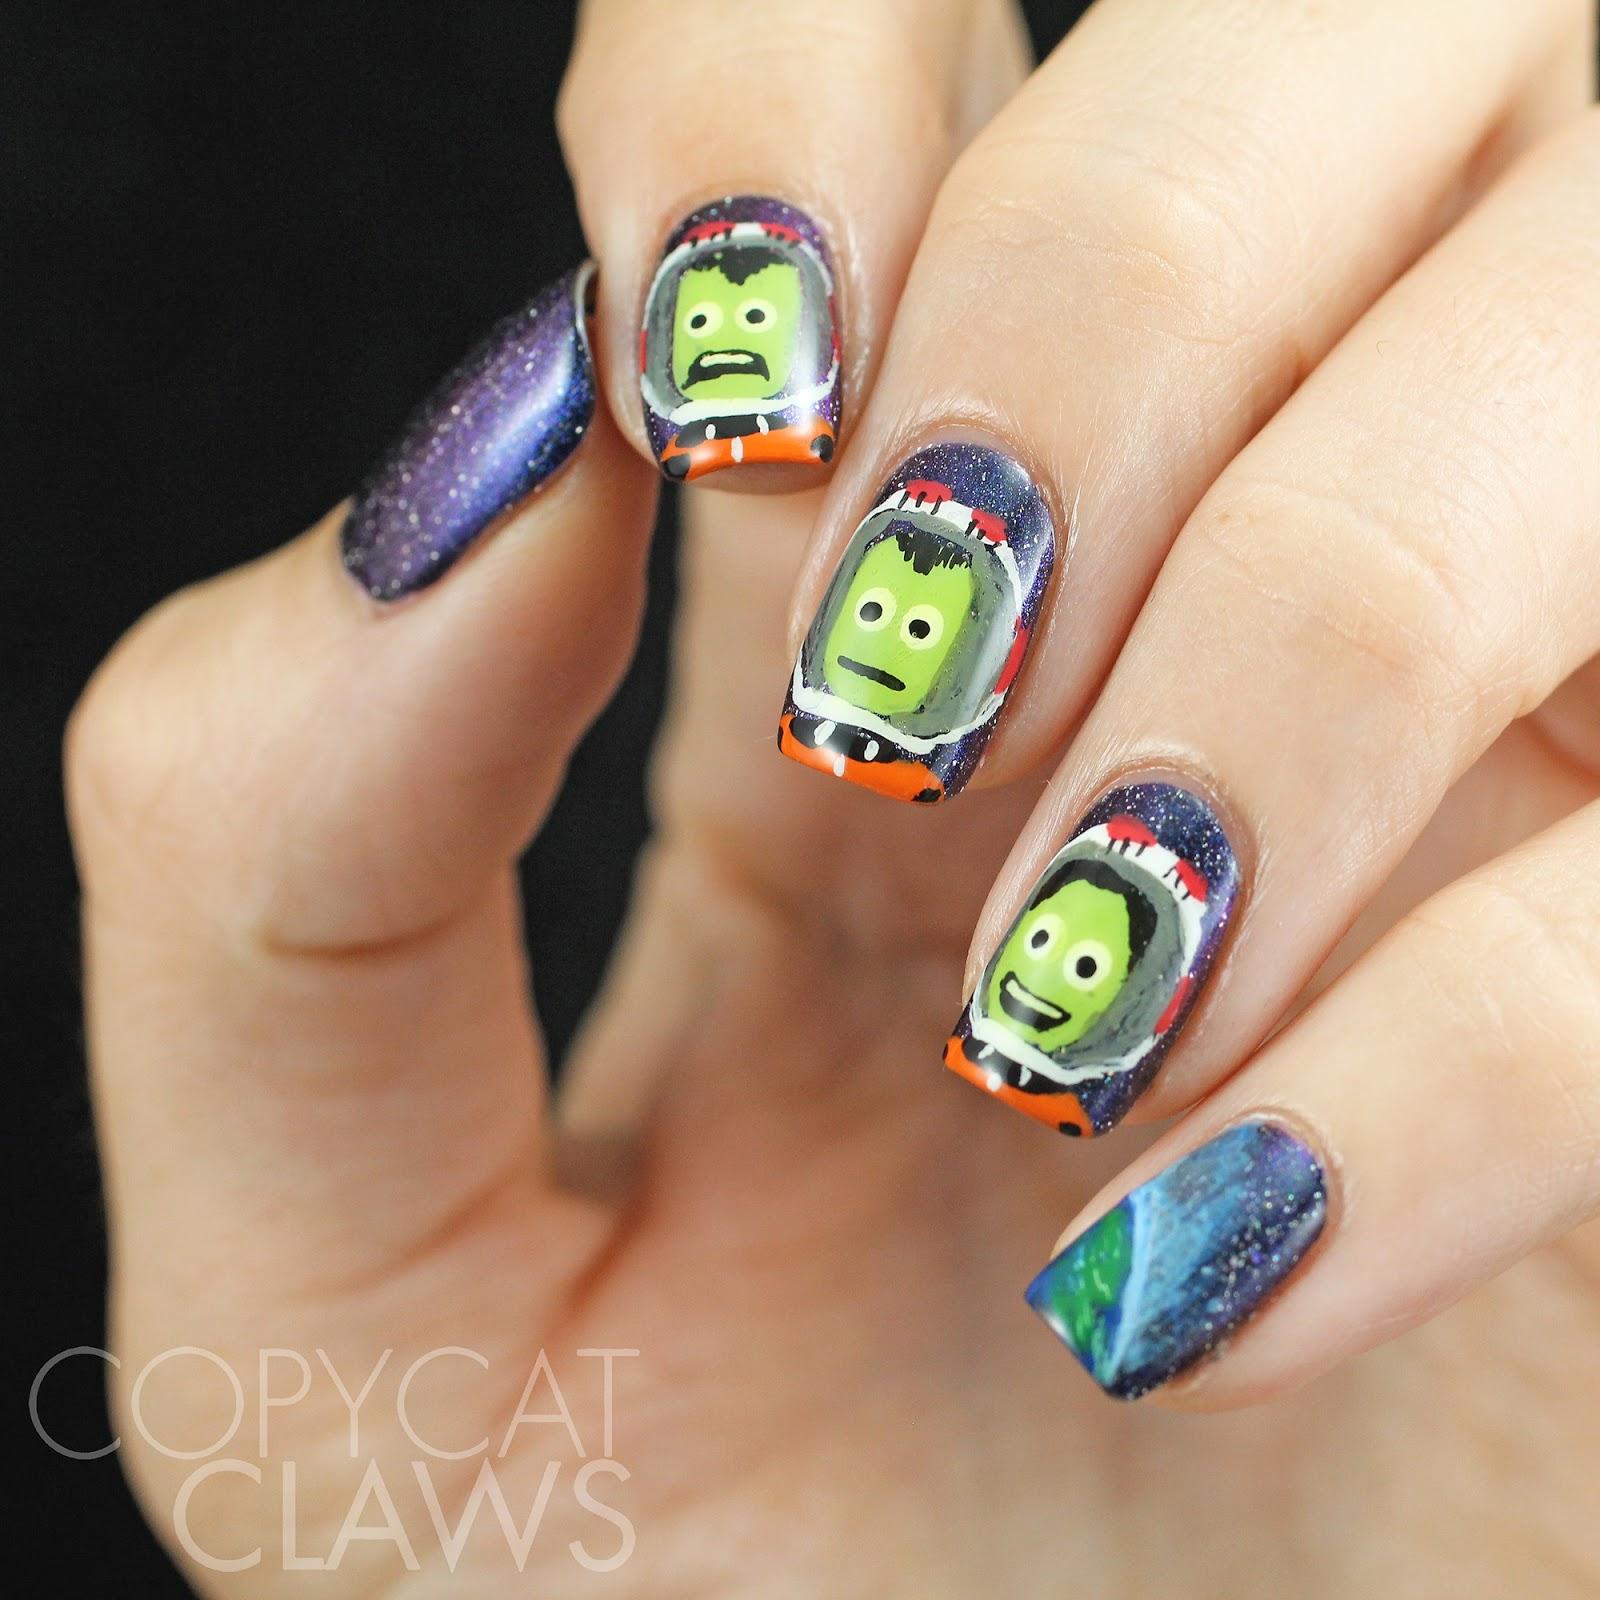 Copycat Claws: 40 Great Nail Art Ideas - Geeks